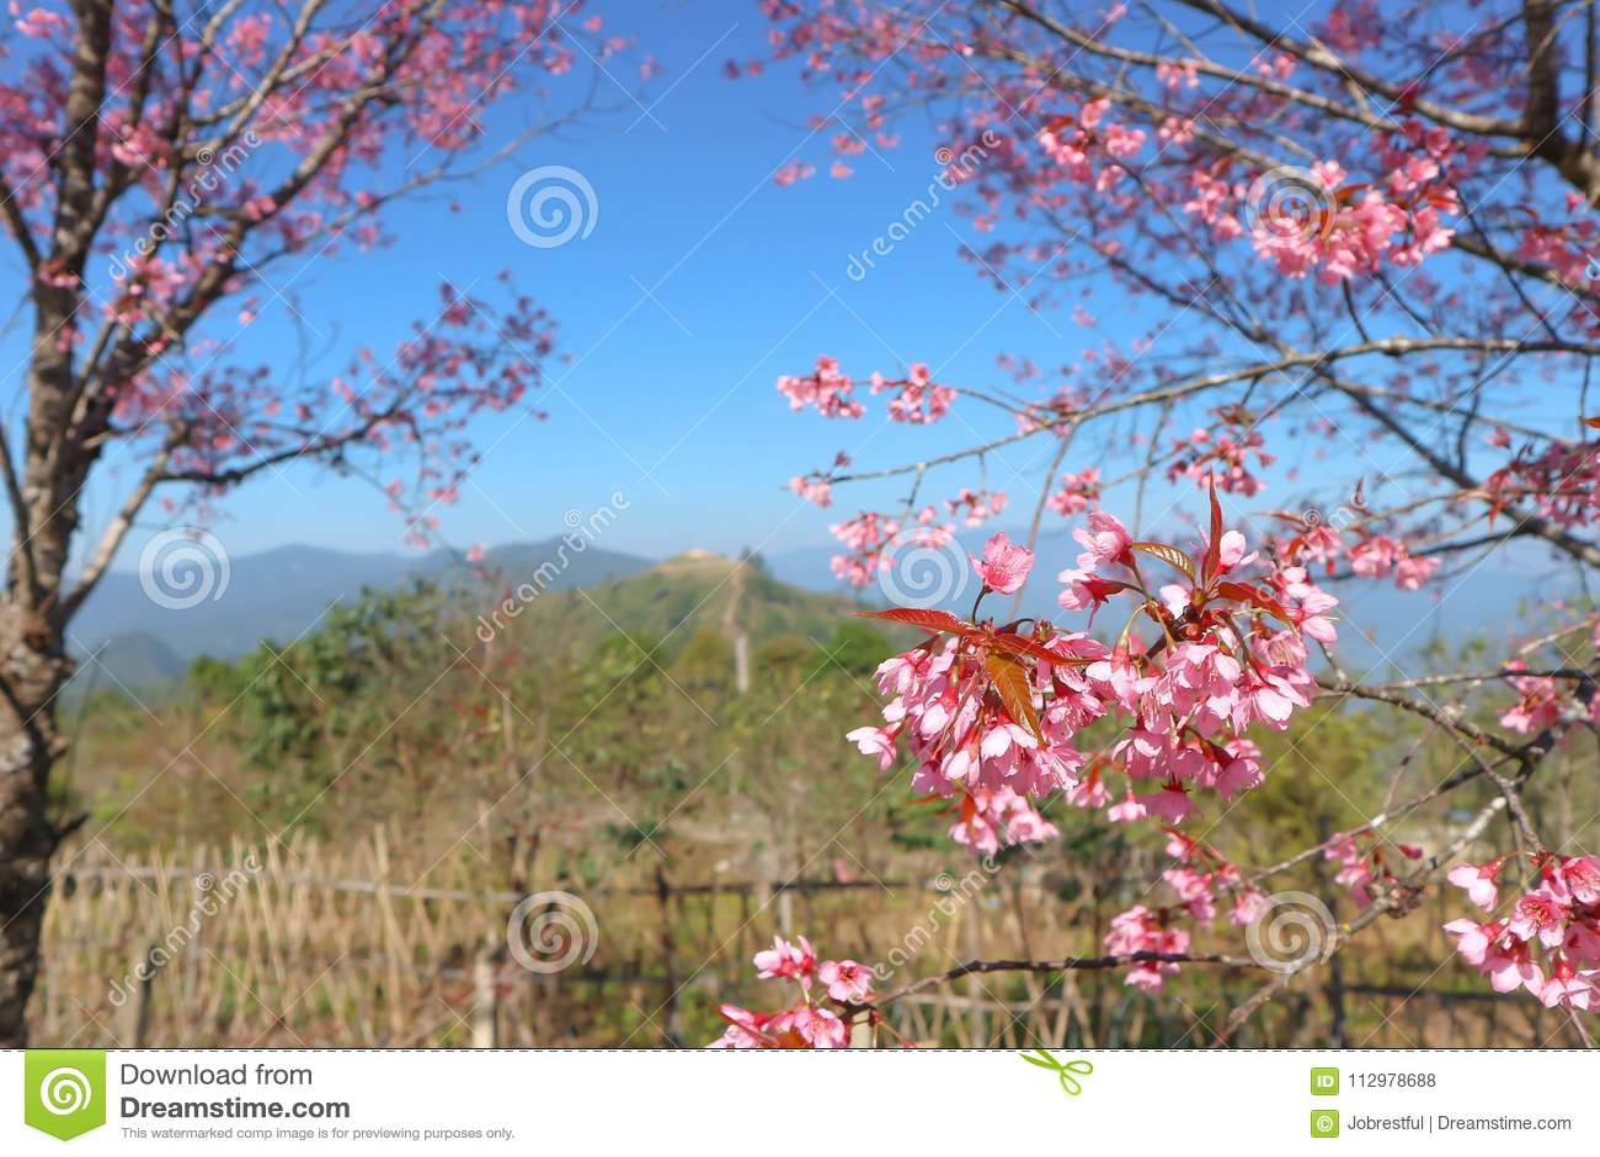 Wind himalayan cherry or prunus cerasoides or sakura